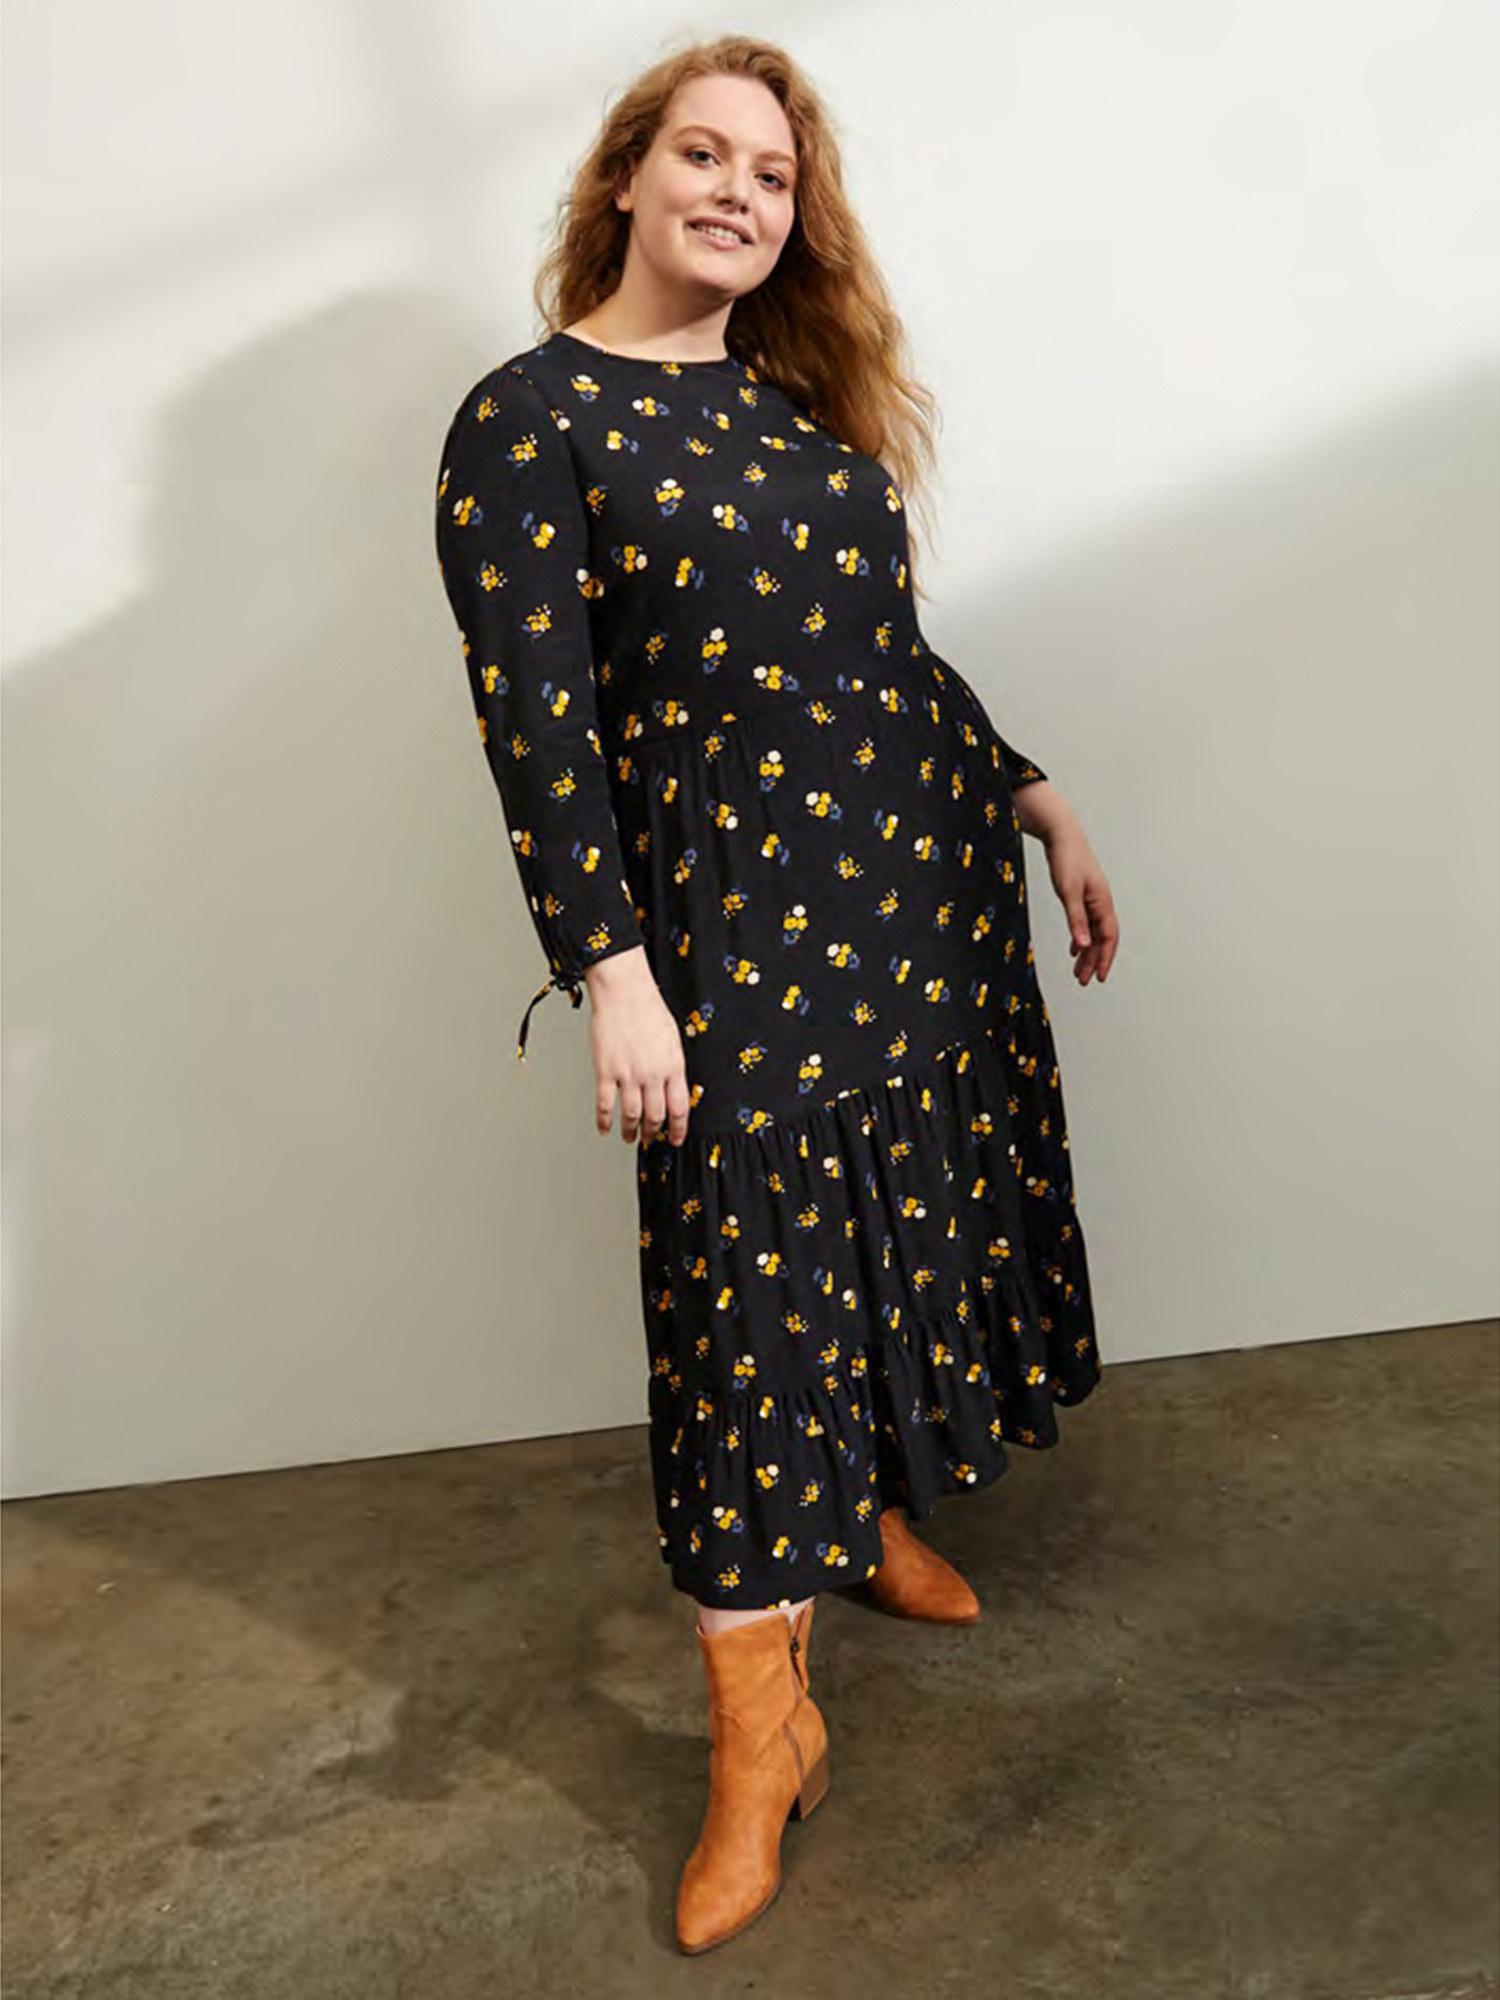 Model wearing tiered maxi dress